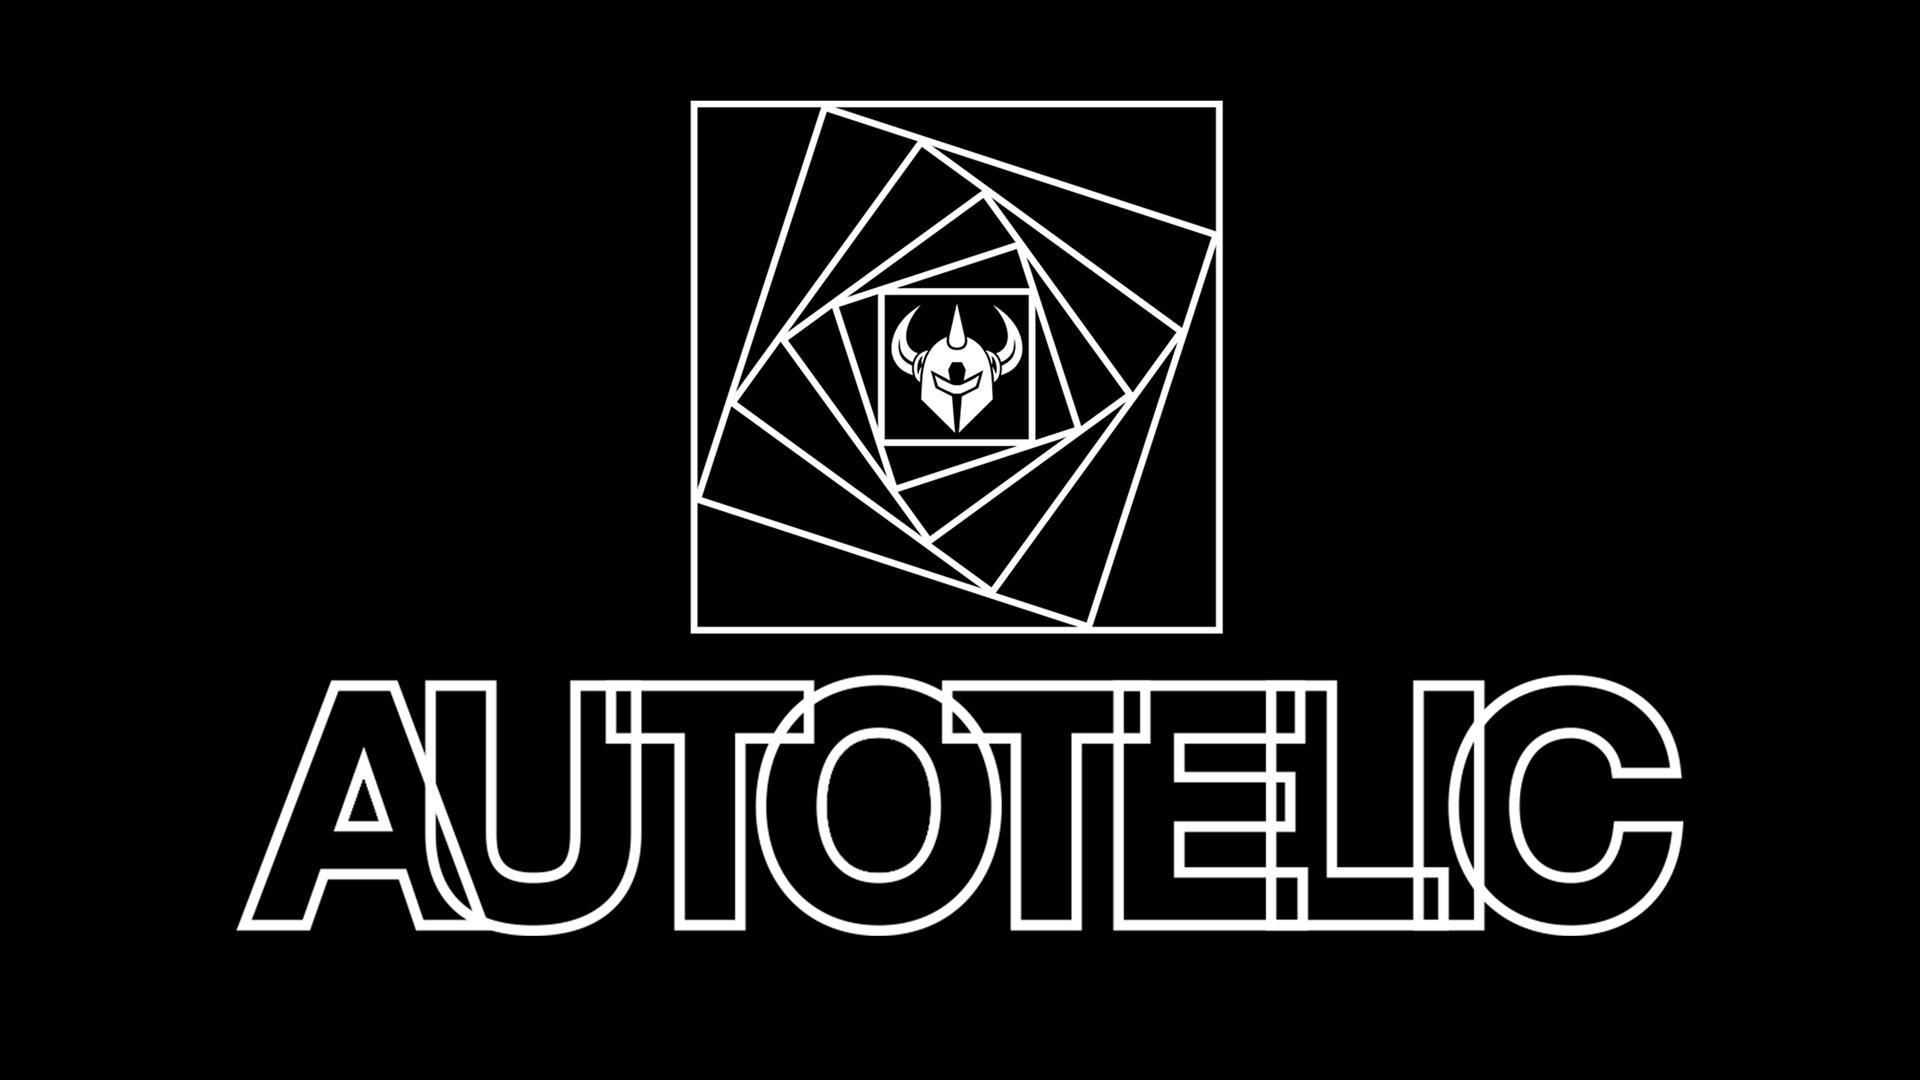 Darkstar_Skateboard_Autotelic_Video_Full_Length_Video